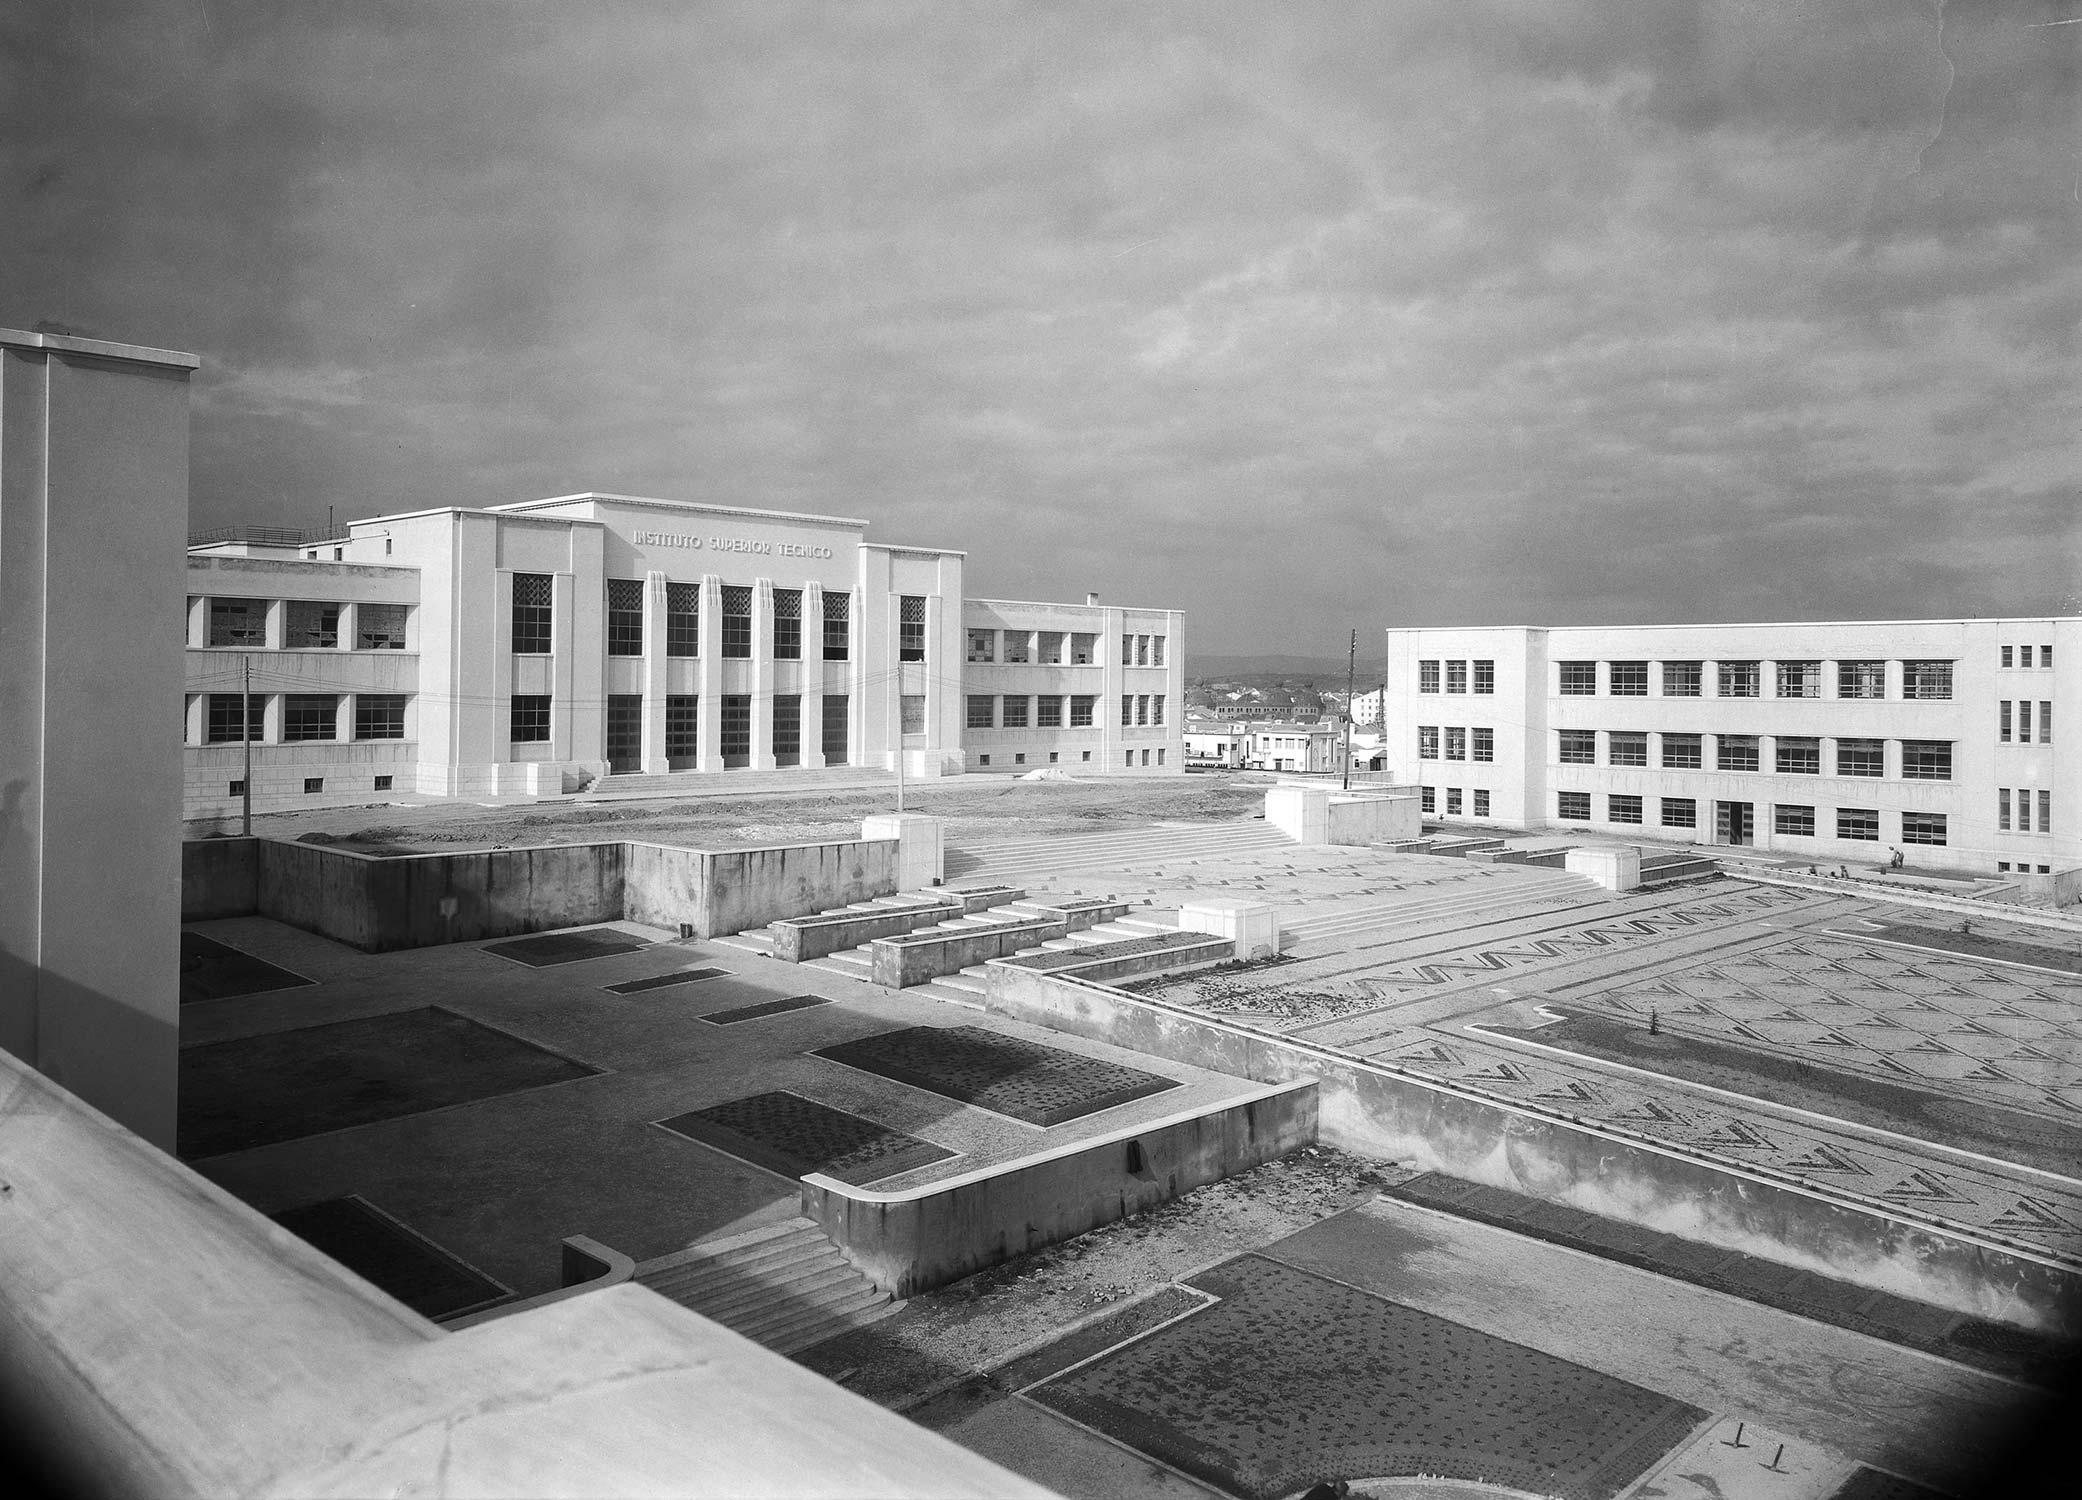 Instituto Superior Técnico, Lisboa, Portugal, 1936-1937